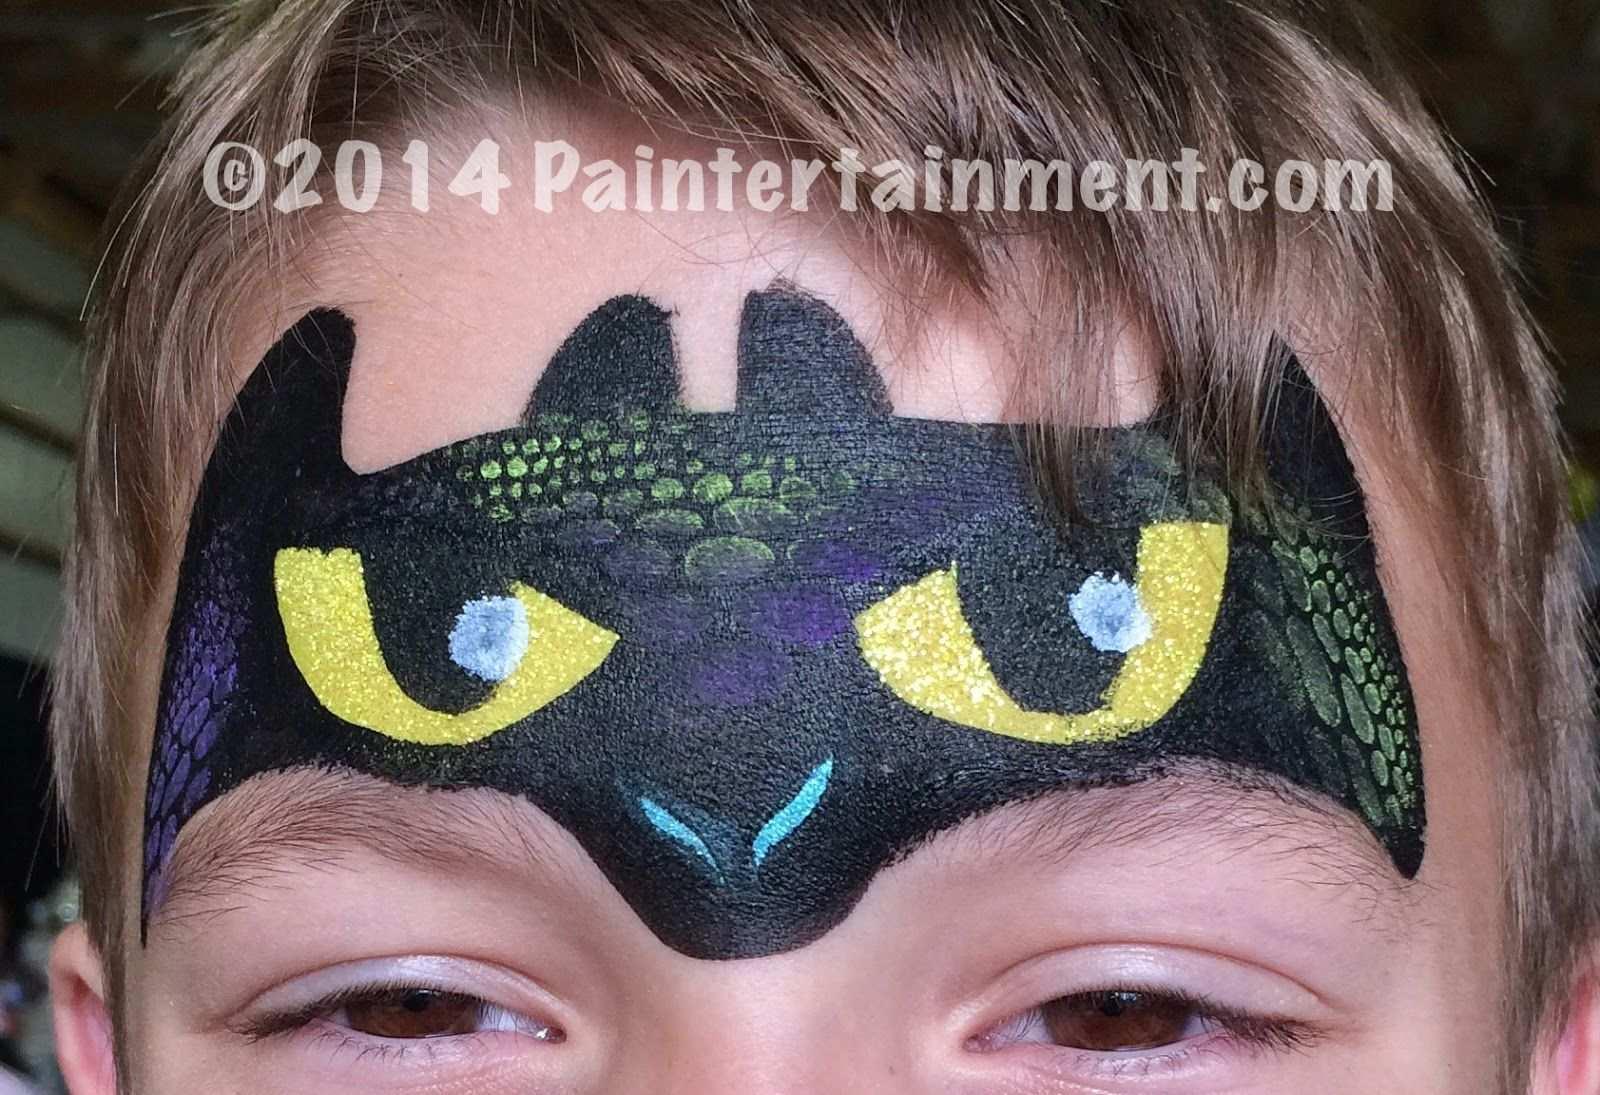 Paintertainment Carver County Fair 2014 Recap Bemalte Gesichter Schminkvorlagen Kinderschminken